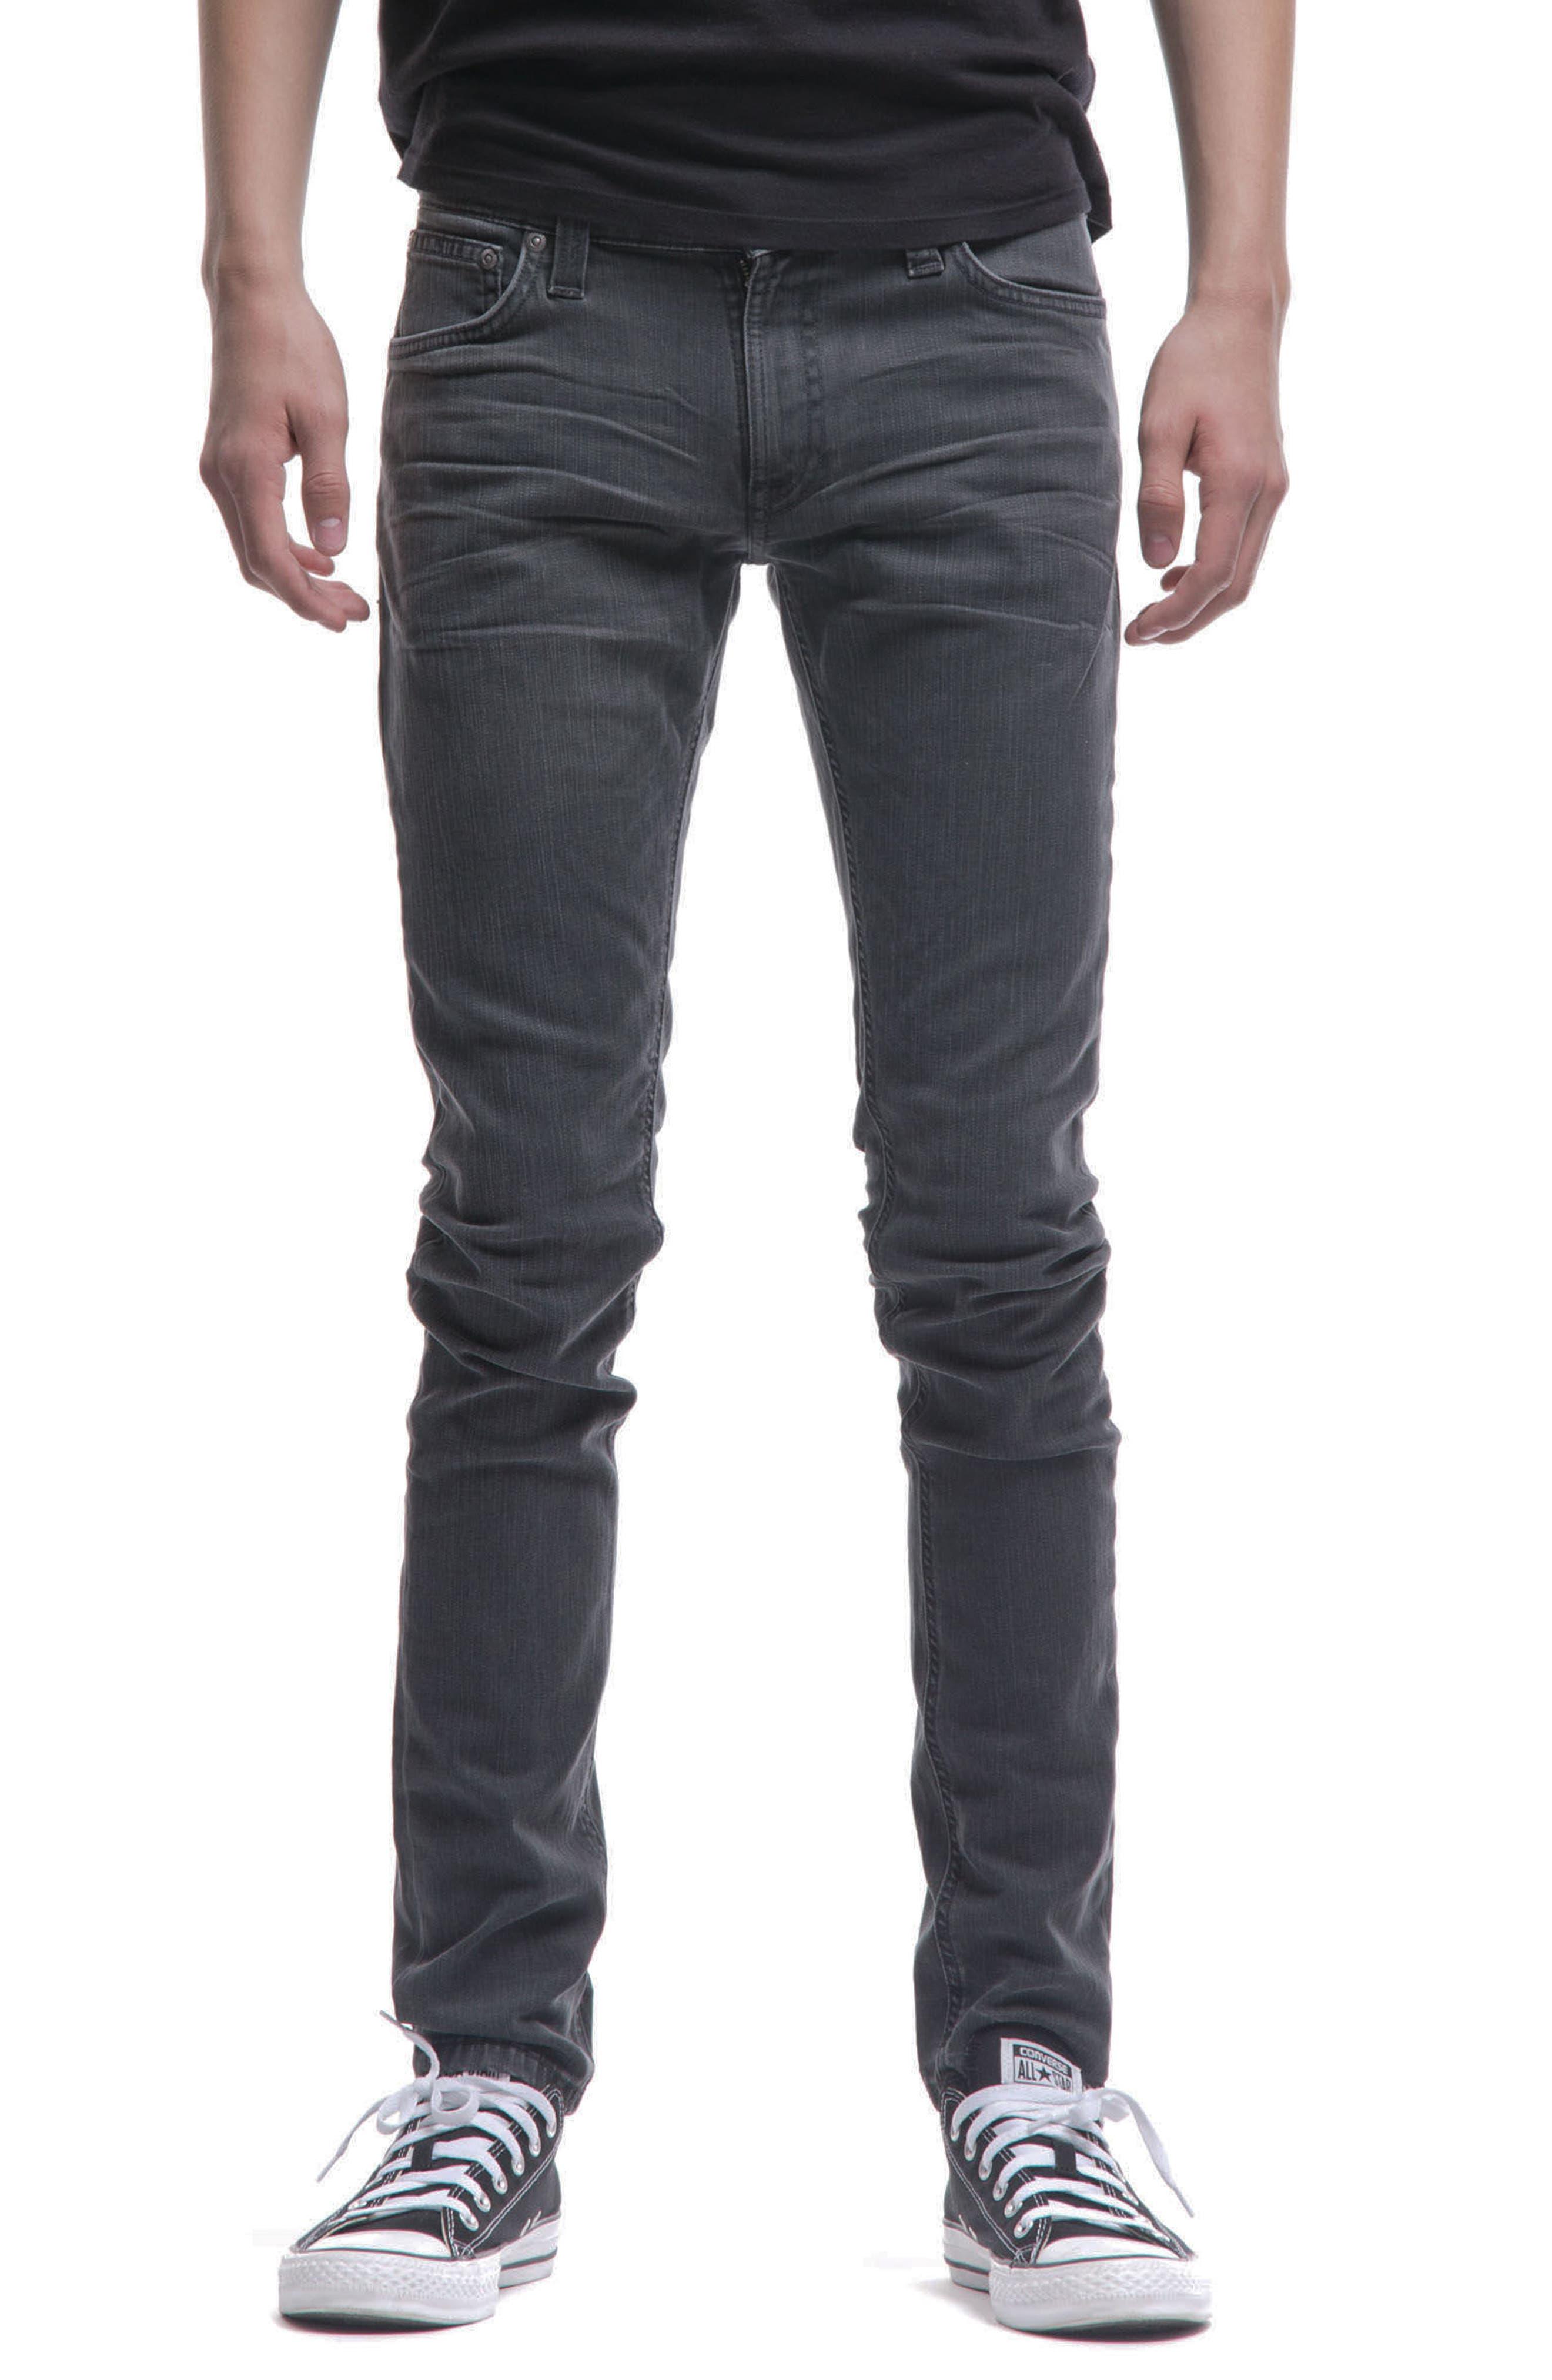 Skinny Lin Skinny Fit Jeans,                         Main,                         color, Black Seas